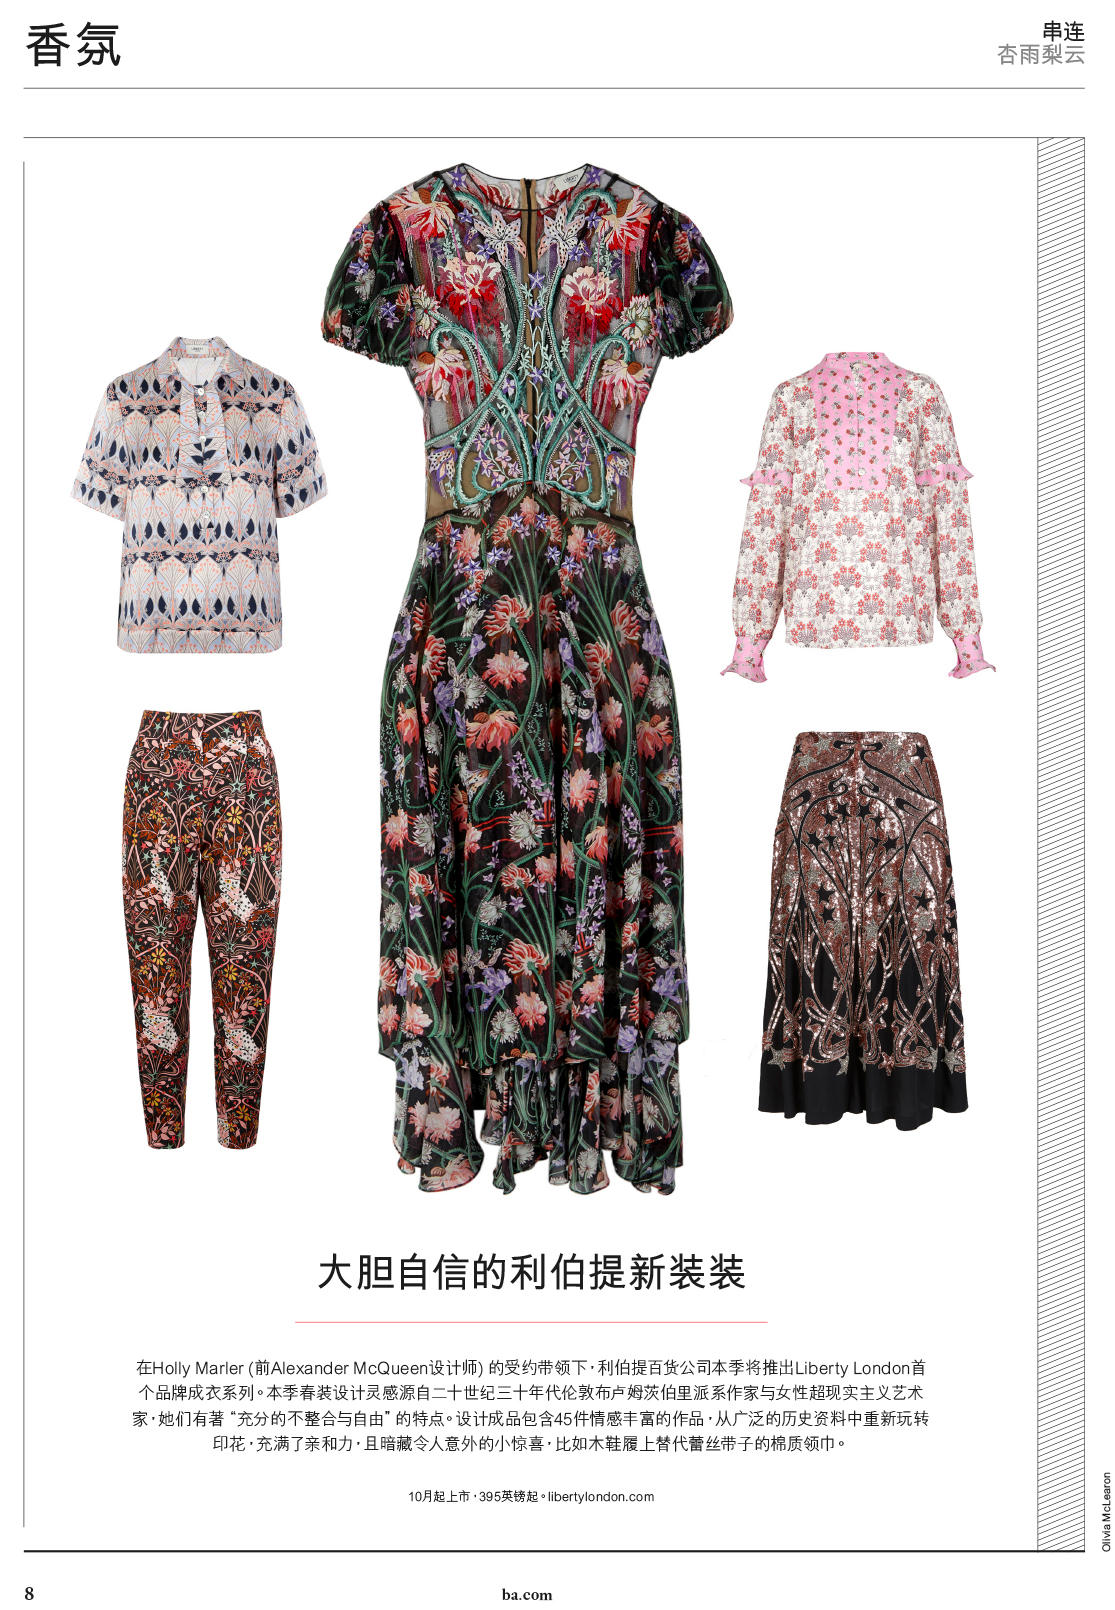 HL China 15